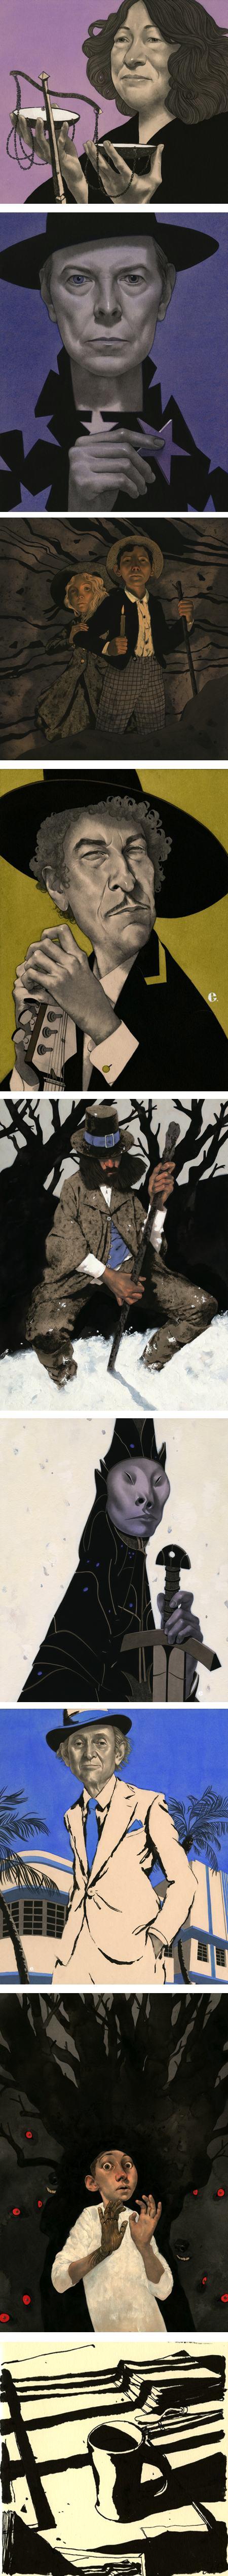 Edward Kinsella, illustration and portraits